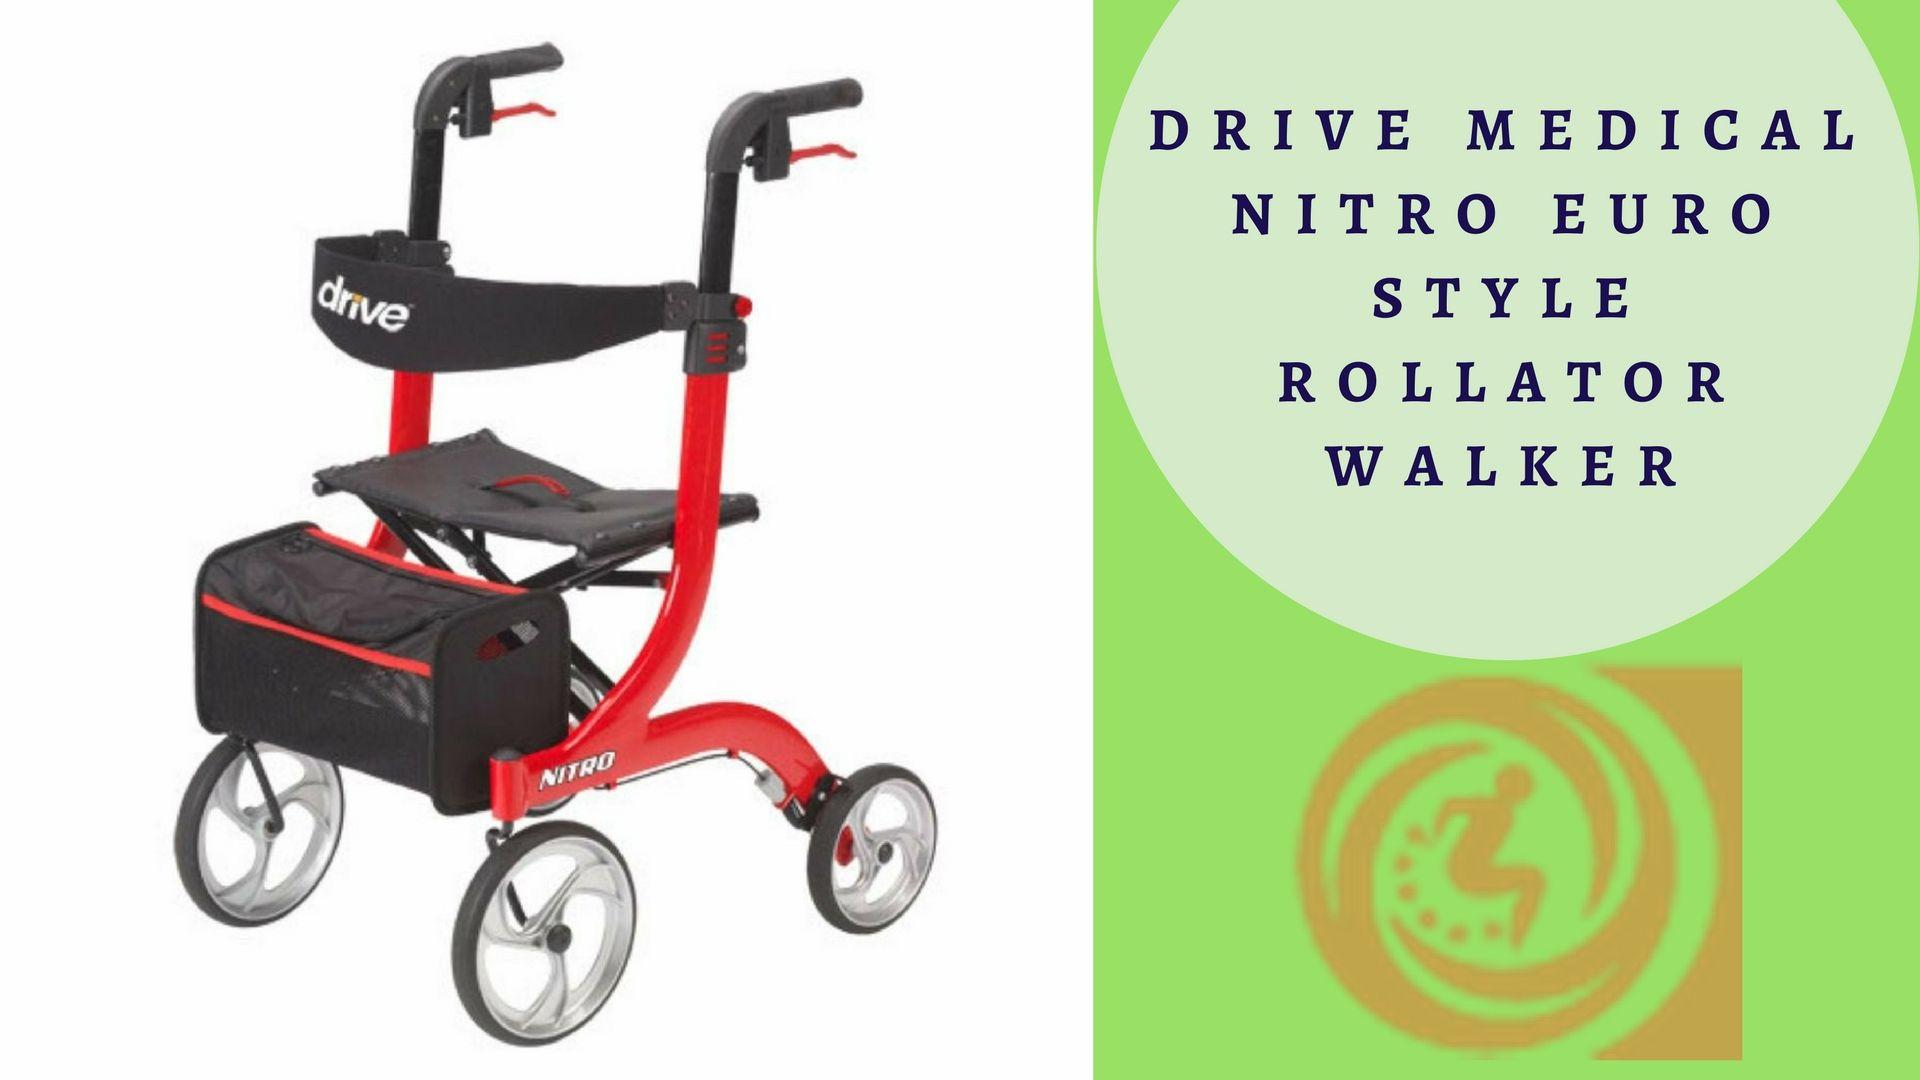 Drive Medical Nitro Euro Style Rollator Walker Euro